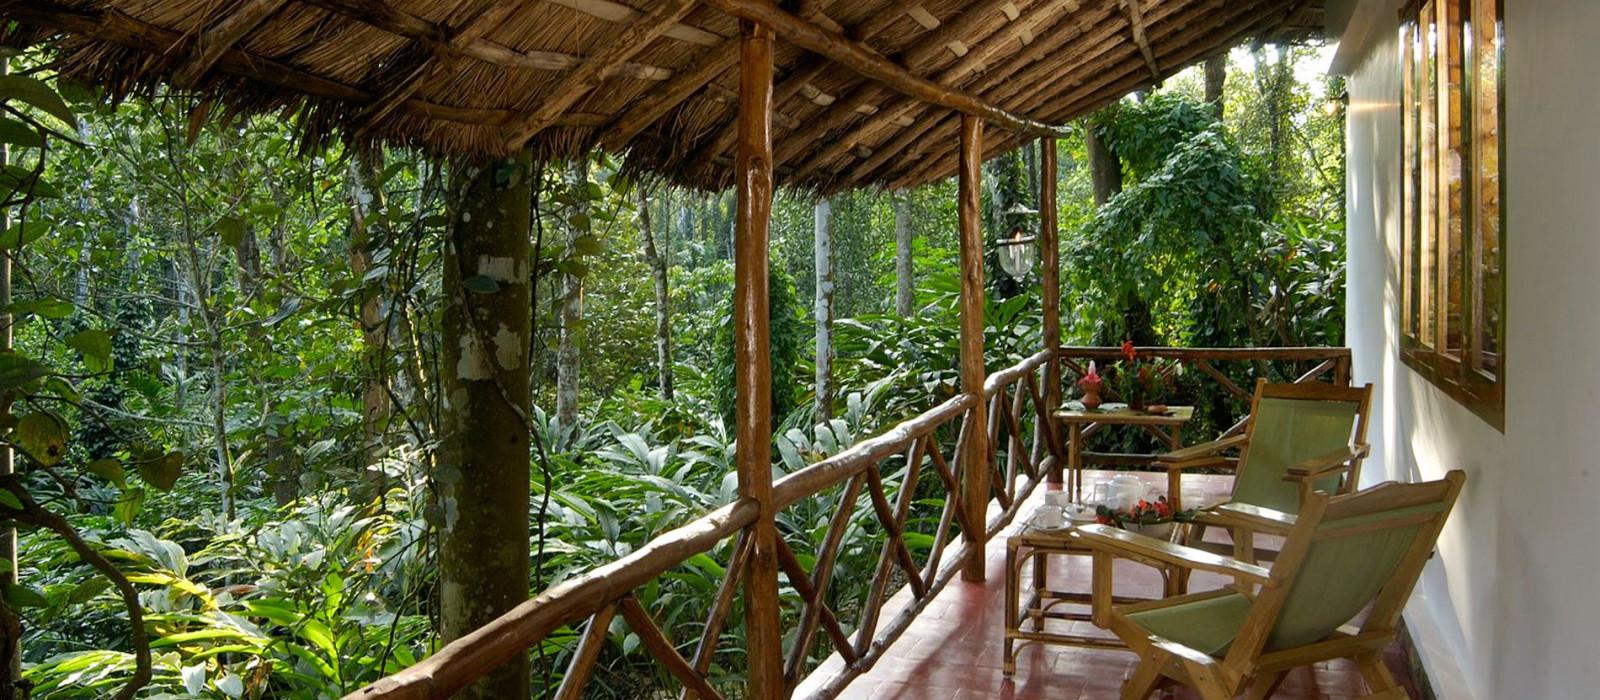 Hotel Shalimar Spice Garden South India